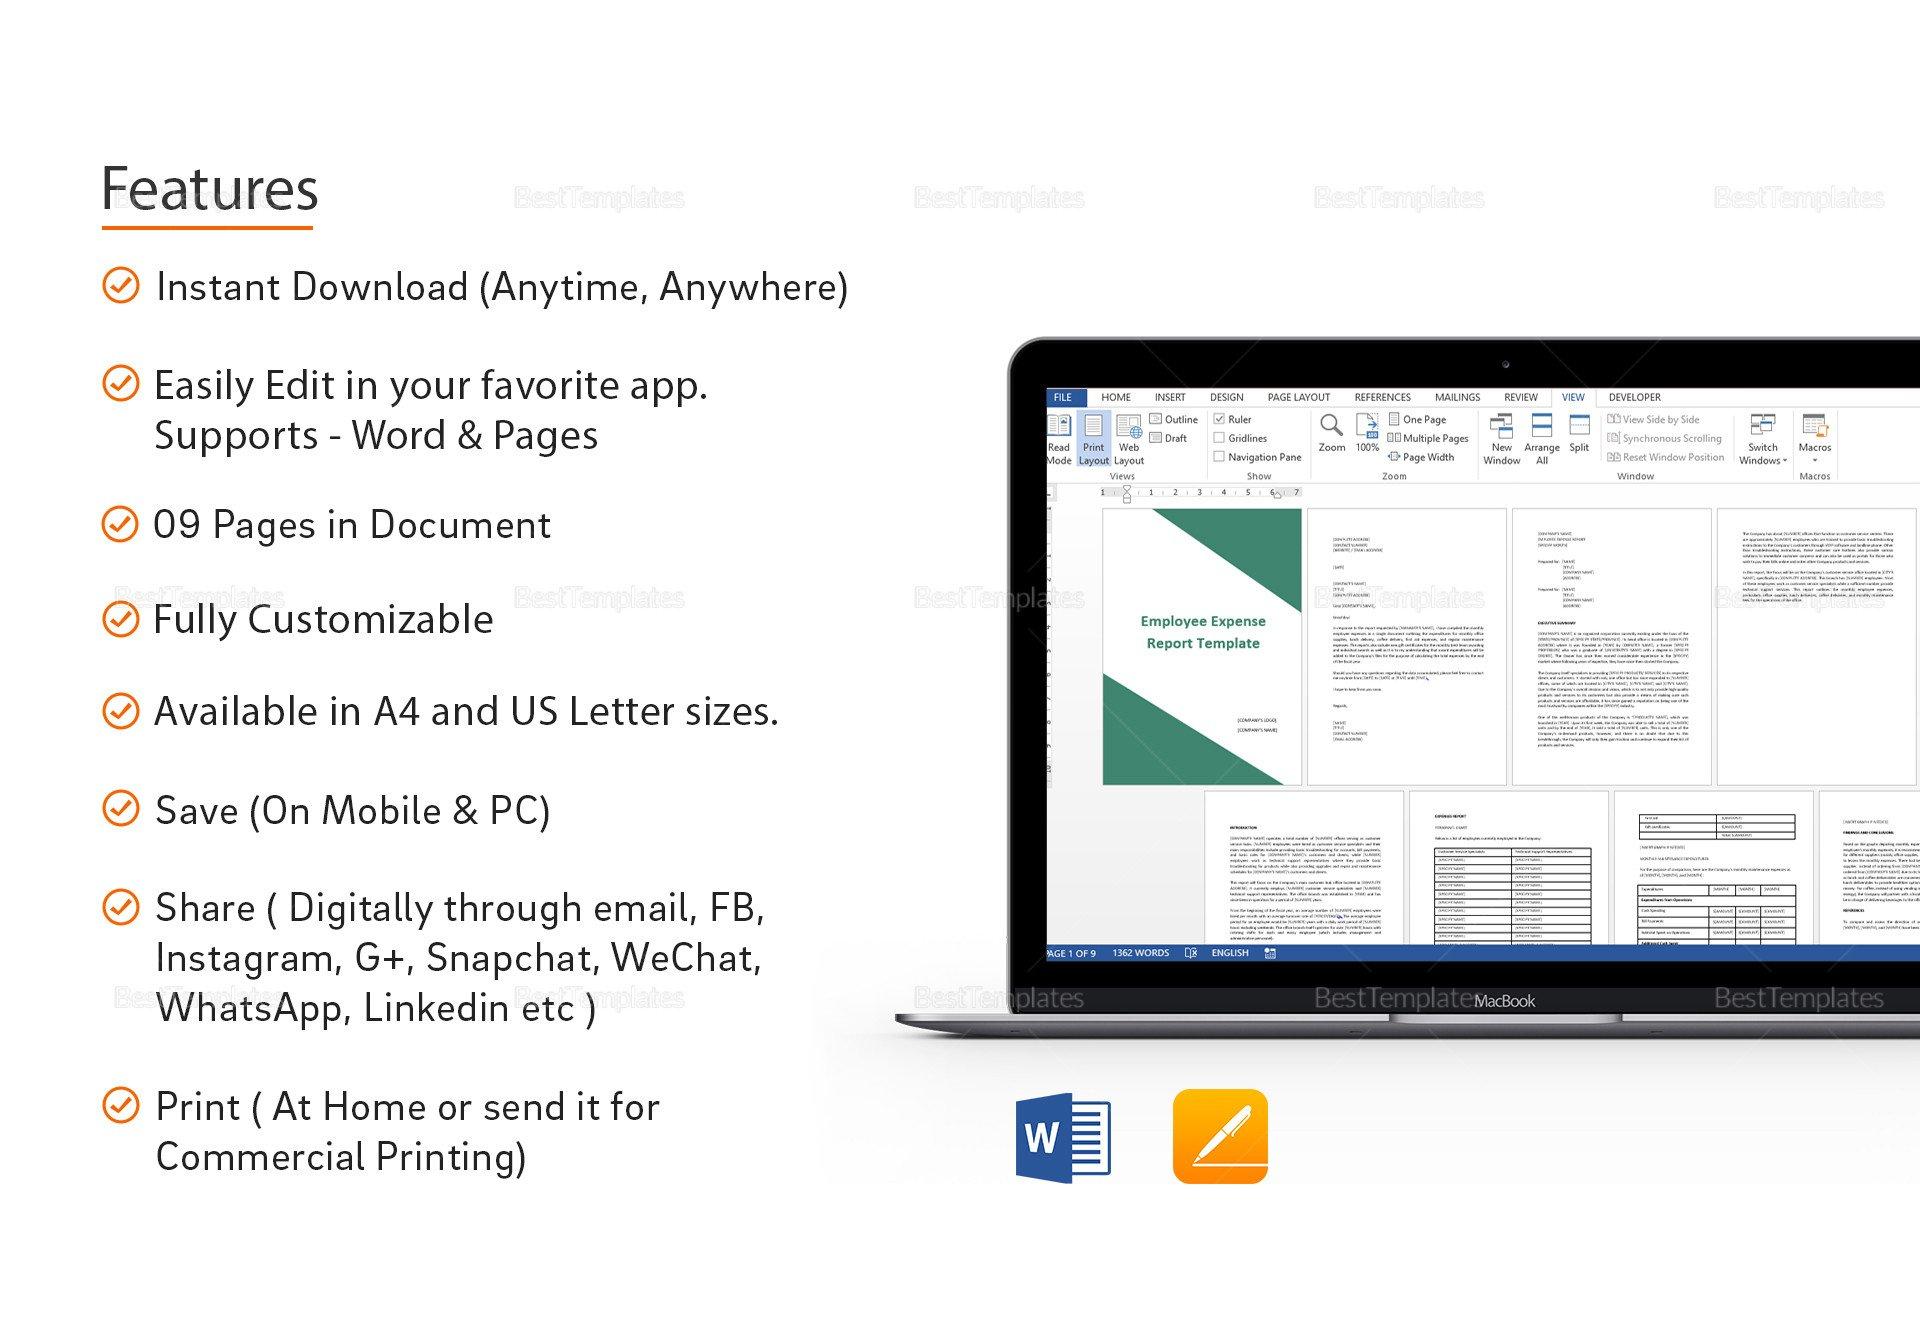 Expense Report Template Google Docs Employee Expense Report Template In Word Google Docs